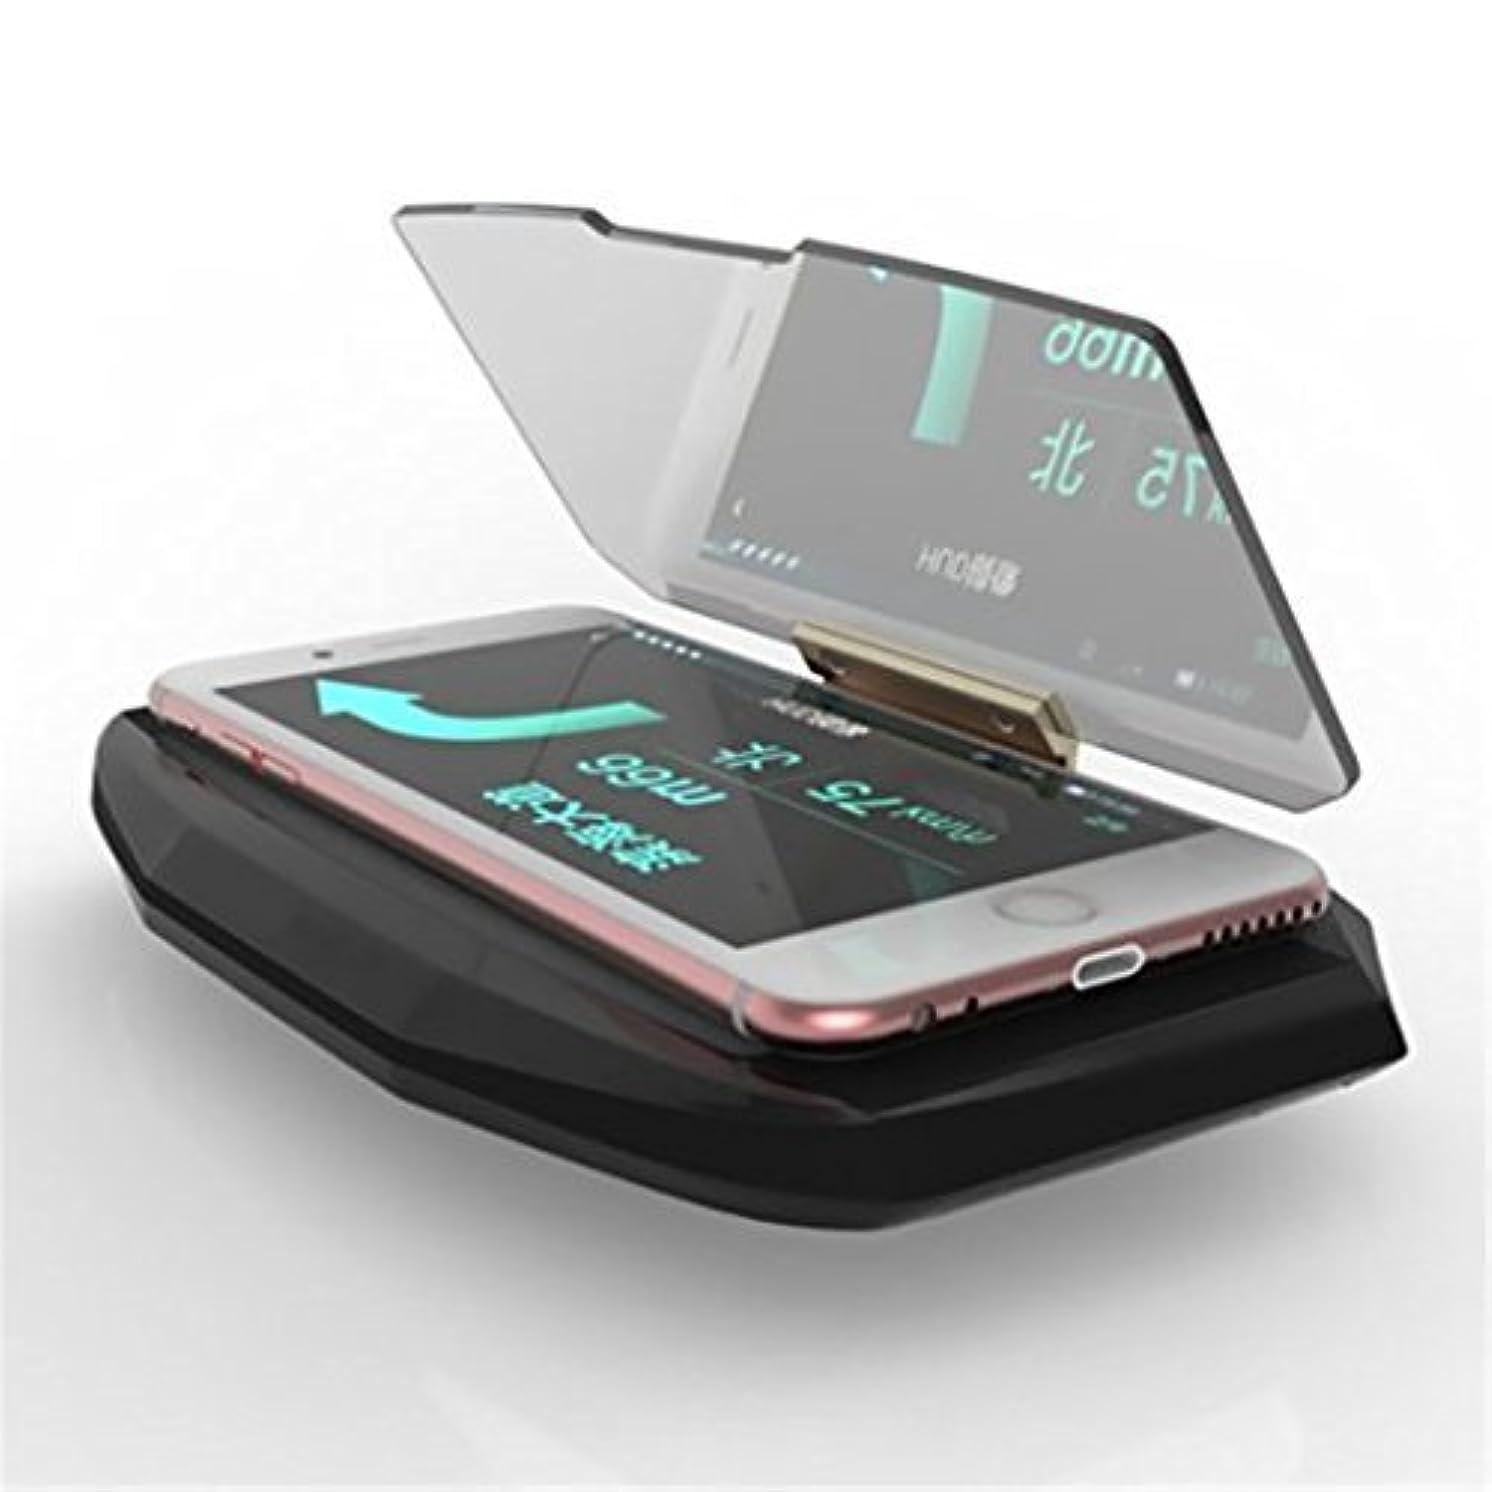 I-Sonite Head Up Display Projector Universal Car HUD Holder Bracket Display Image HD Reflector for Mobile Phone GPS NavigationDoogee T5 Lite